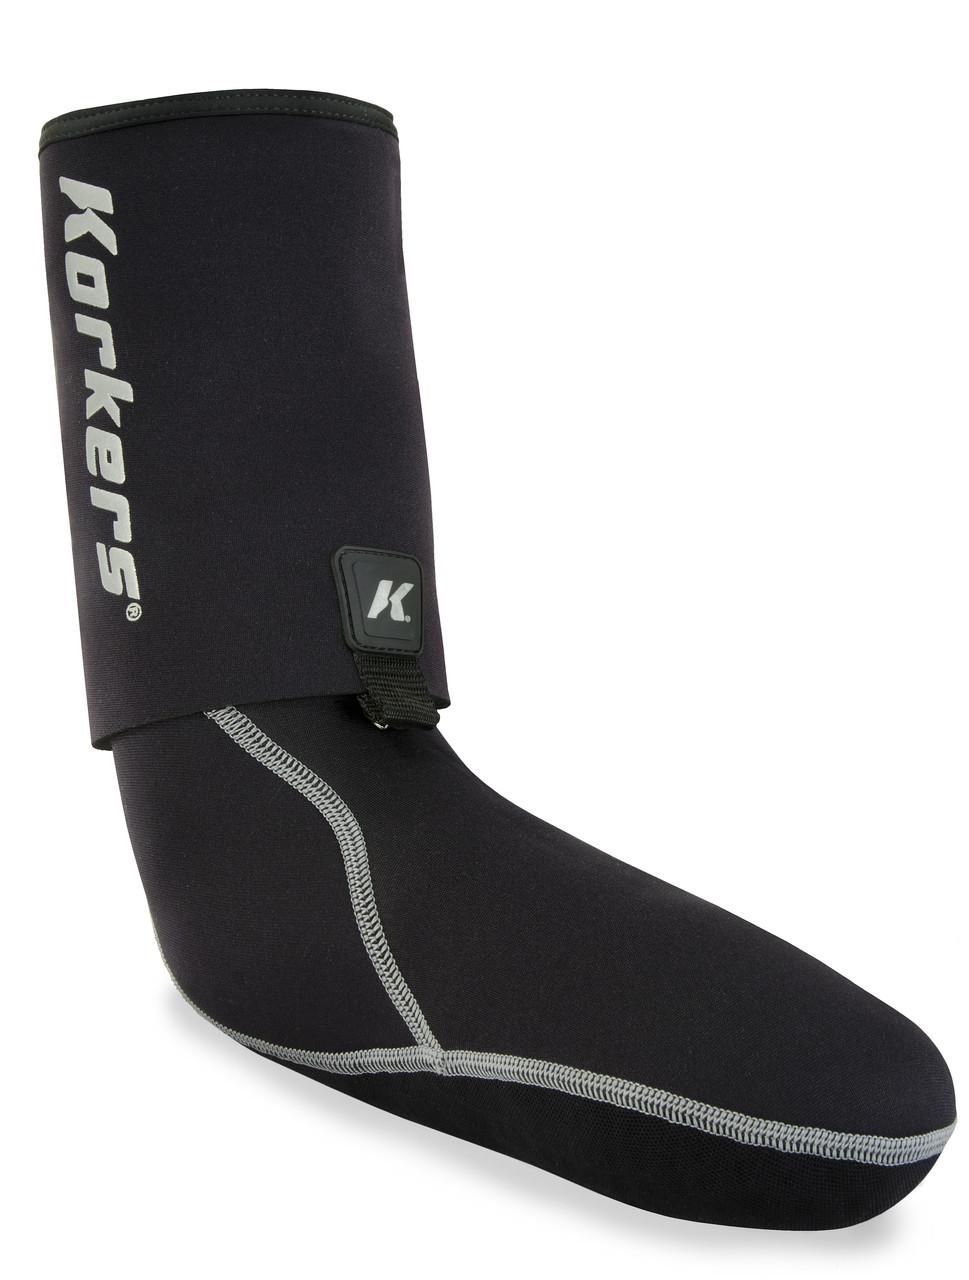 Korkers I-DRAIN Neoprene Guard Socks 3.5MM Medium (Sizes 9-10)